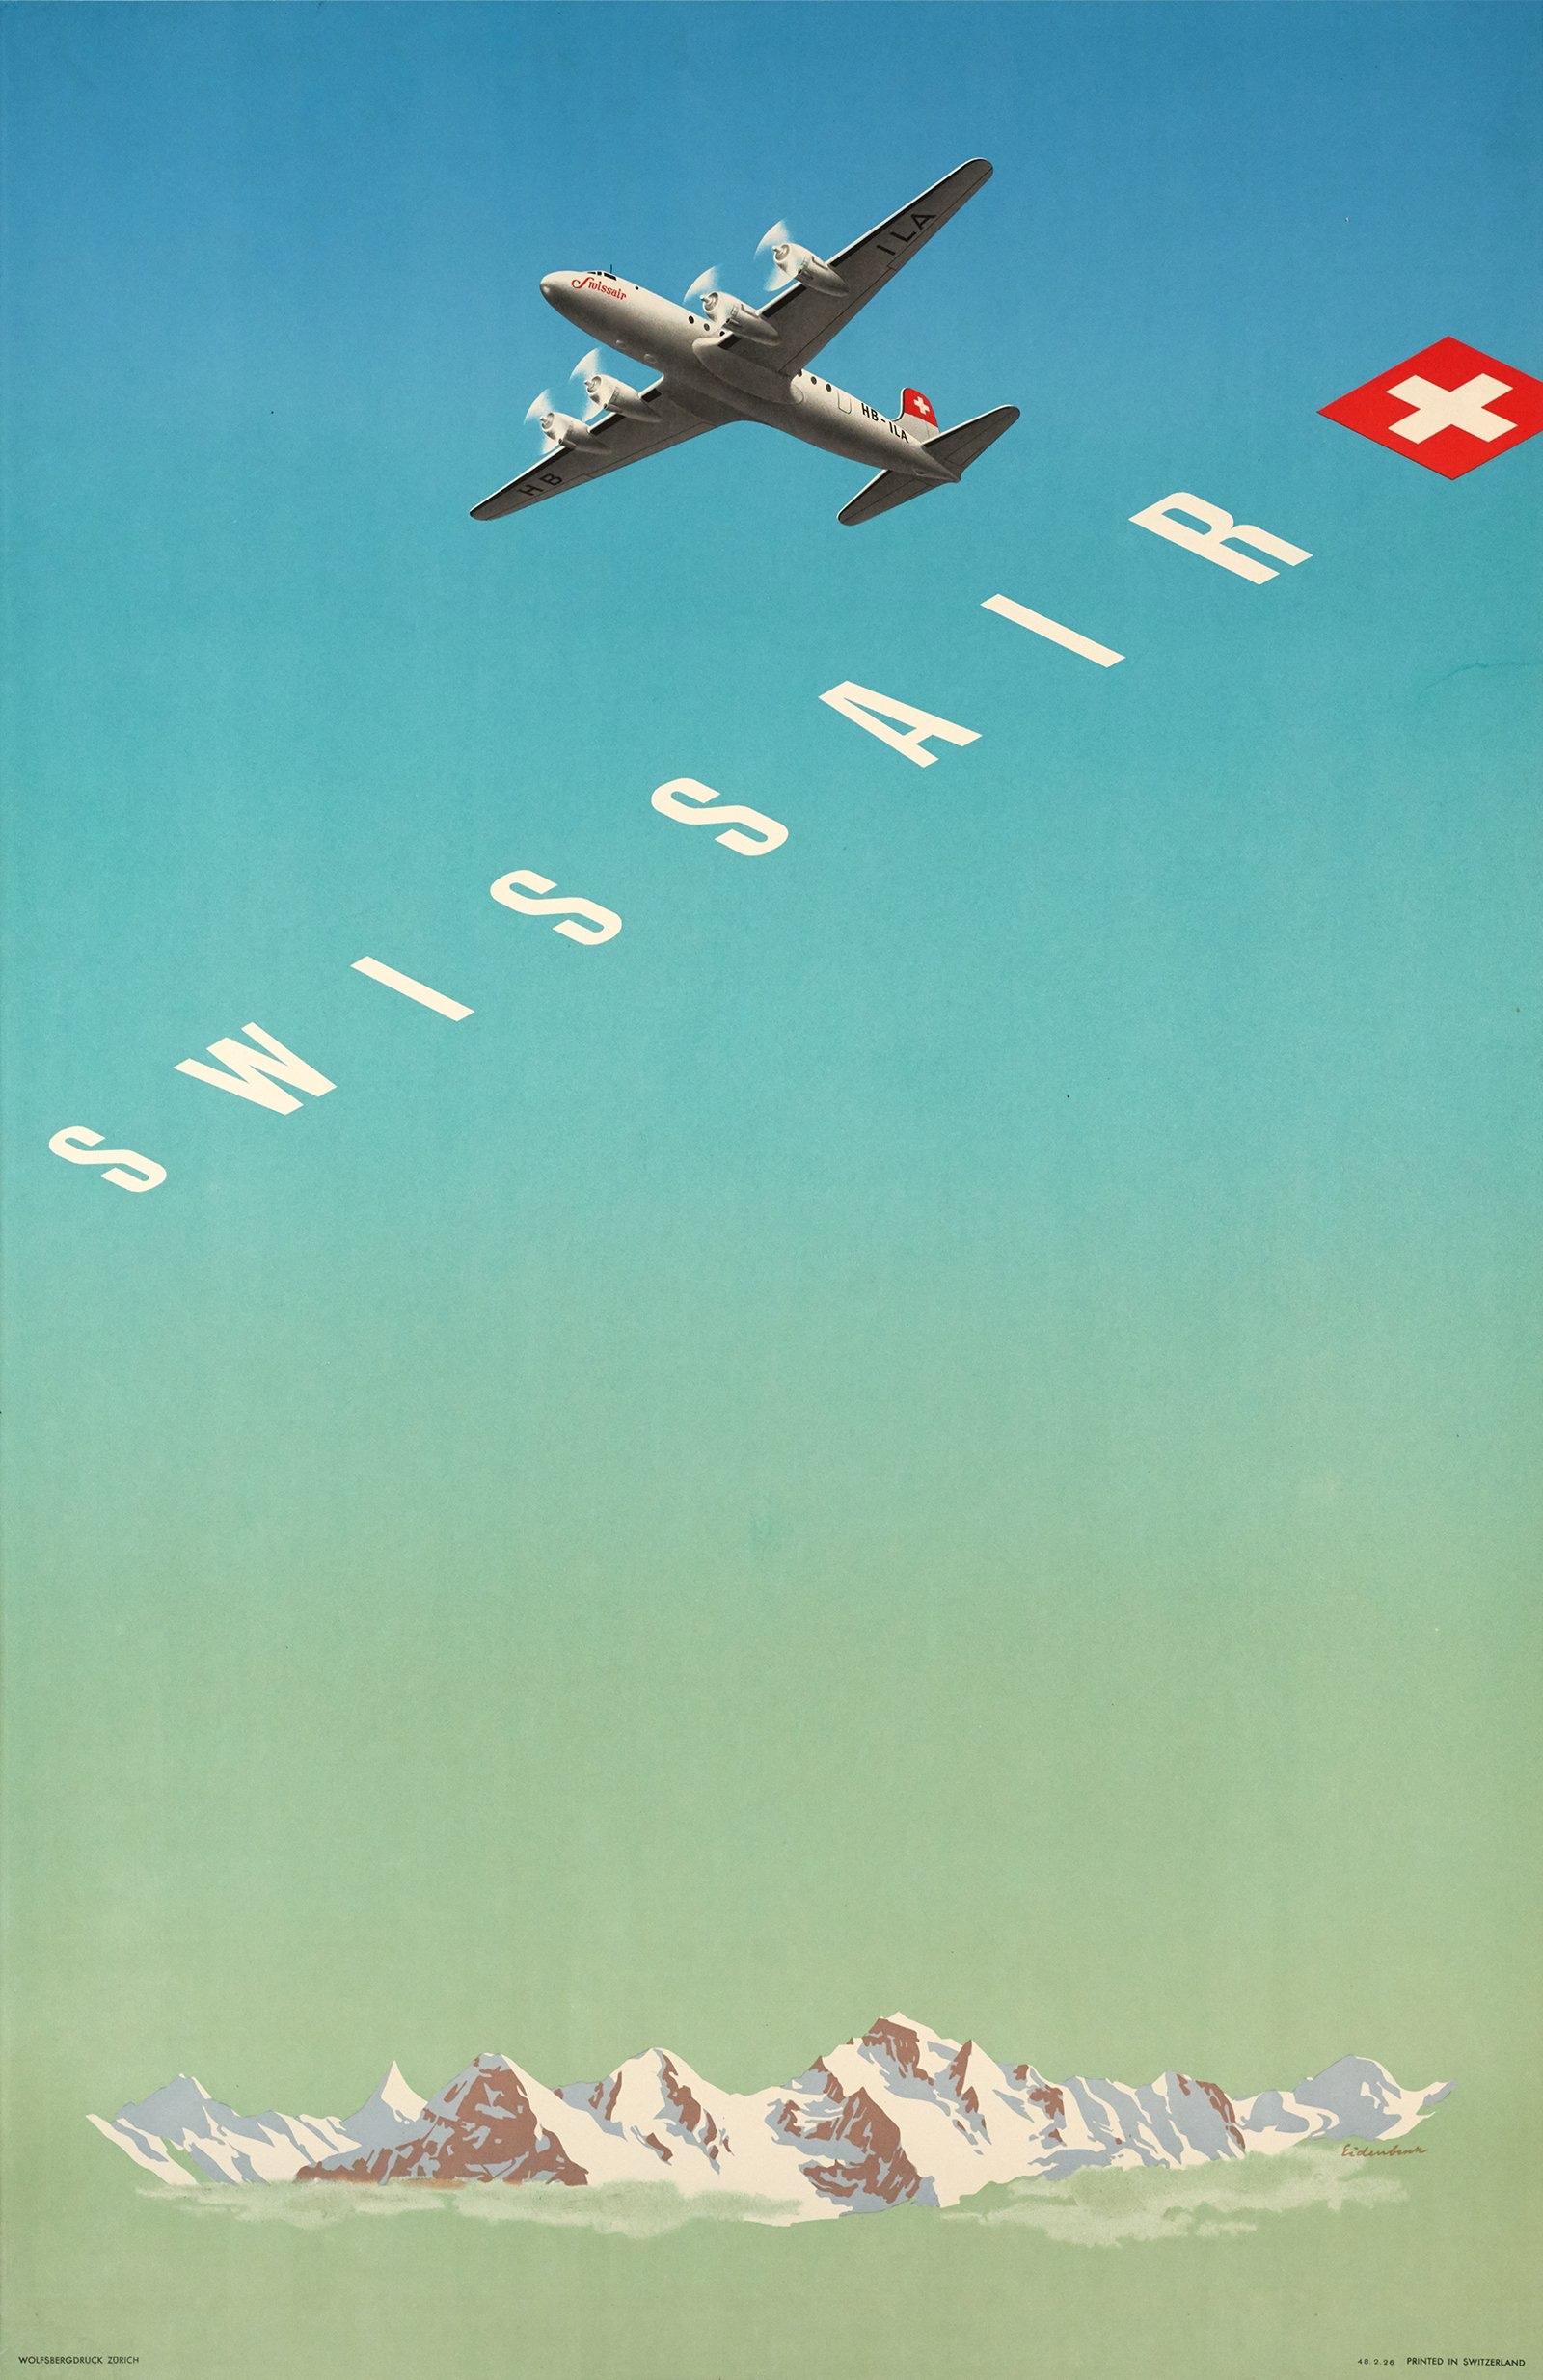 Hermann Eidenbenz, 1948: Swissair